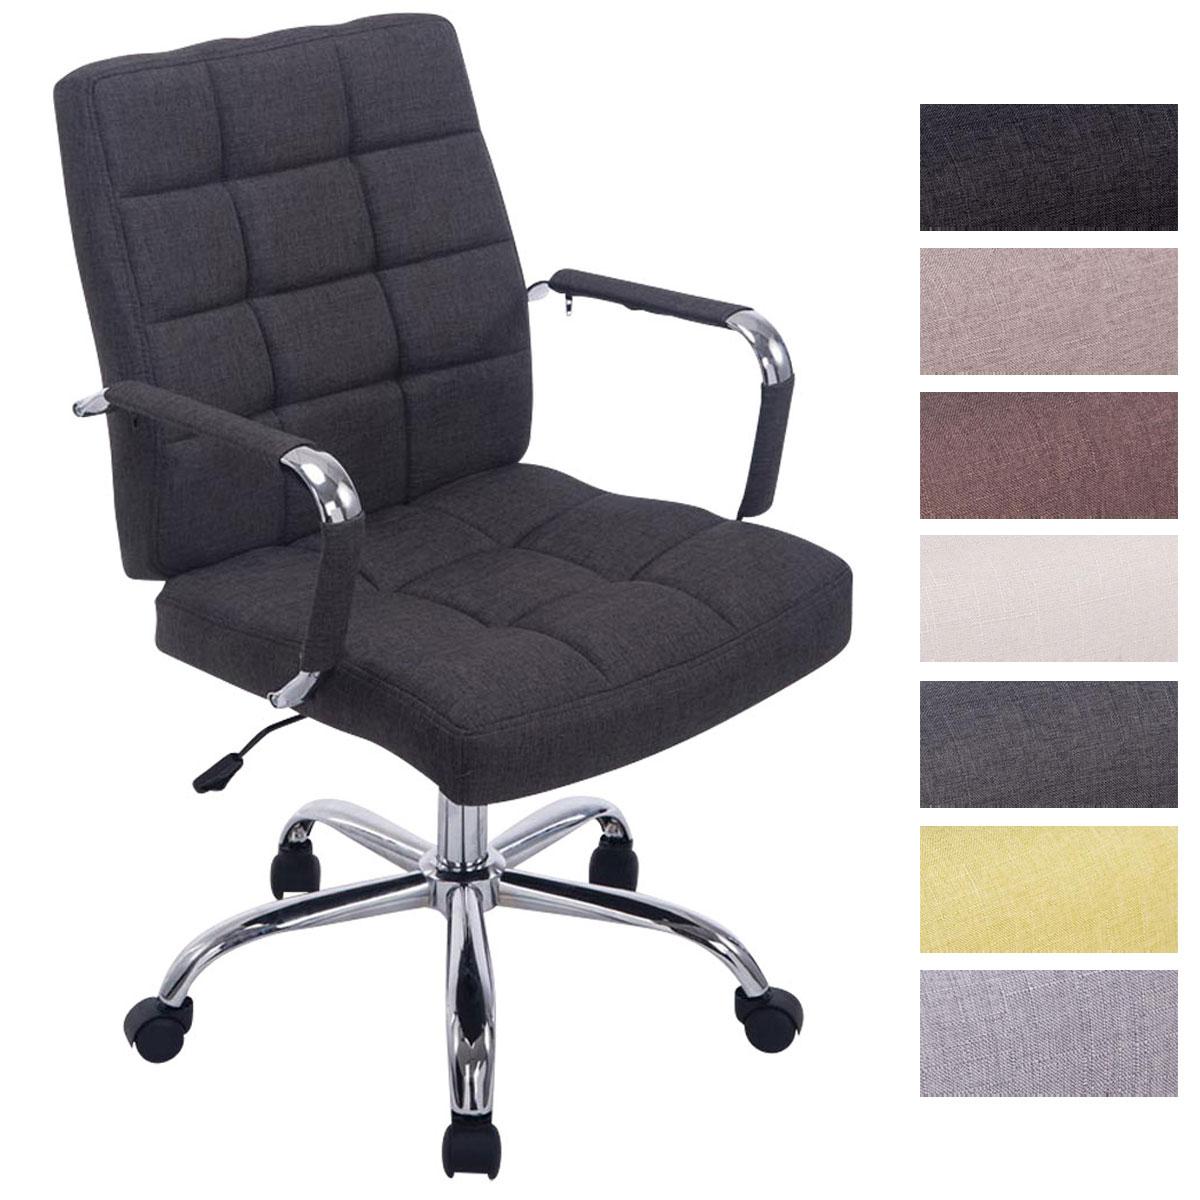 chaise bureau deli pro tissu fauteuil ordinateur r glable accoudoirs m tal neuf ebay. Black Bedroom Furniture Sets. Home Design Ideas